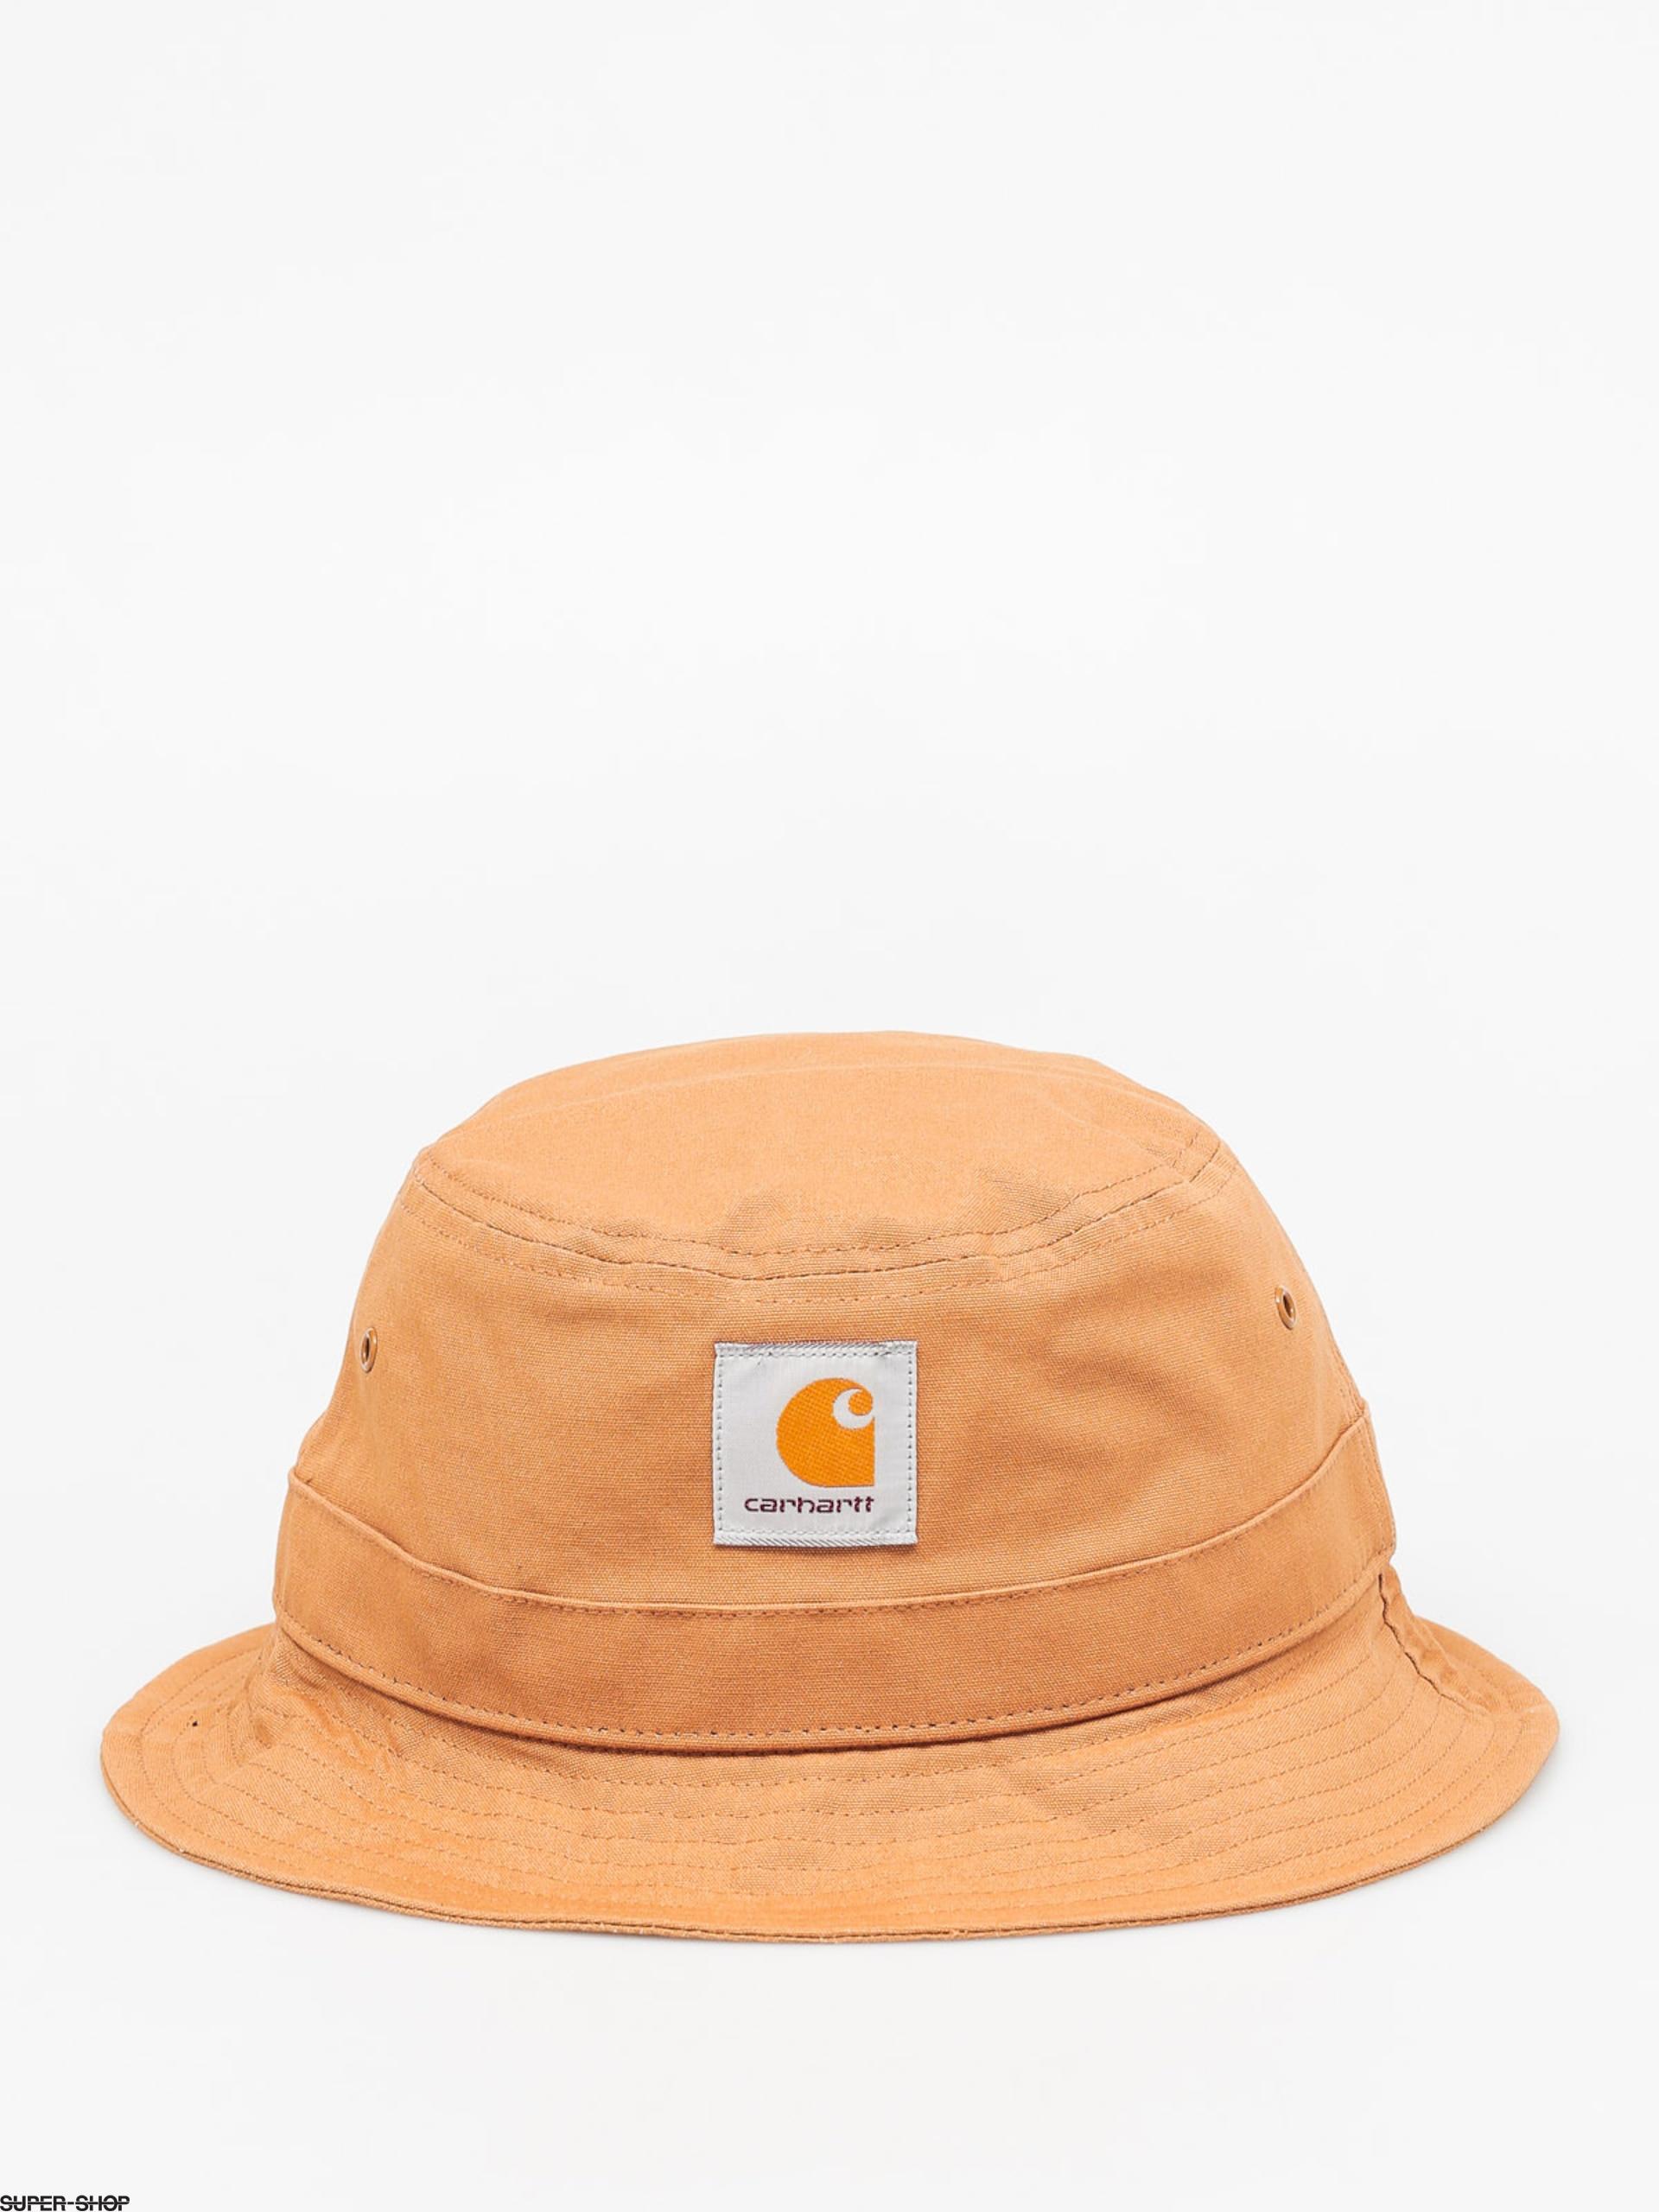 20a7d6c0c1415 843200-w1920-carhartt-hat-watch-bucket-hamilton-brown.jpg